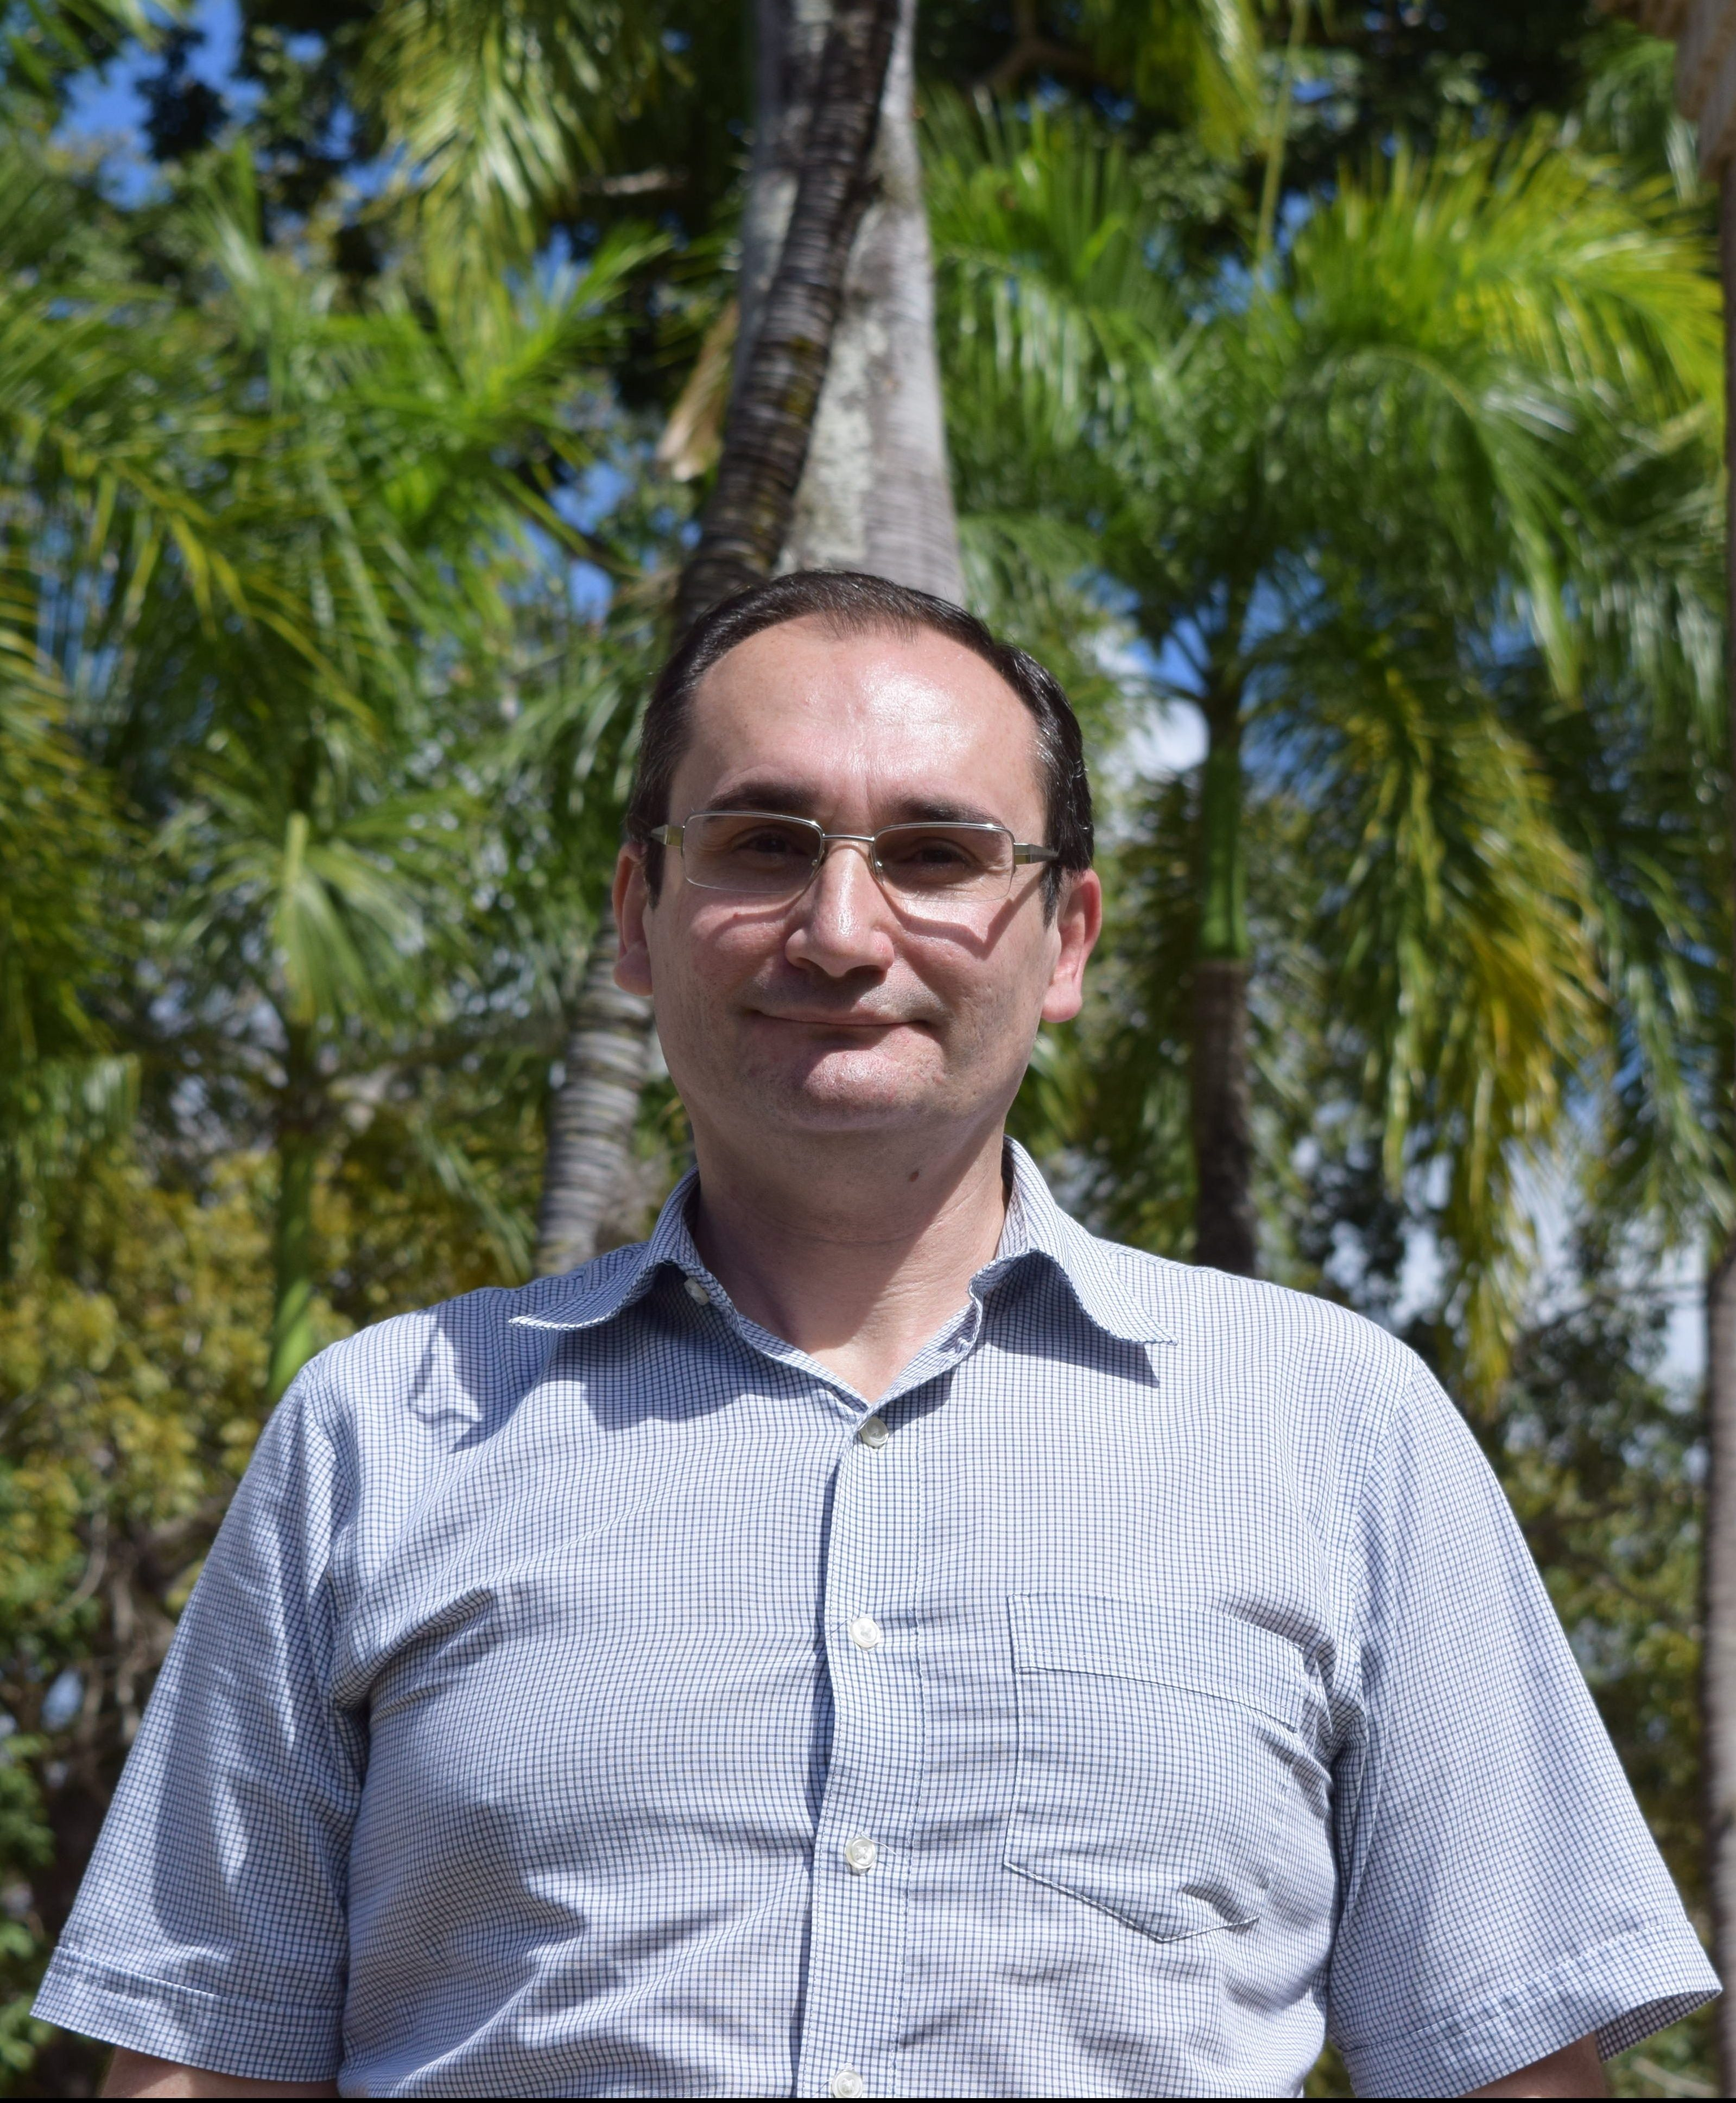 Guillermo Araya, Ph.D